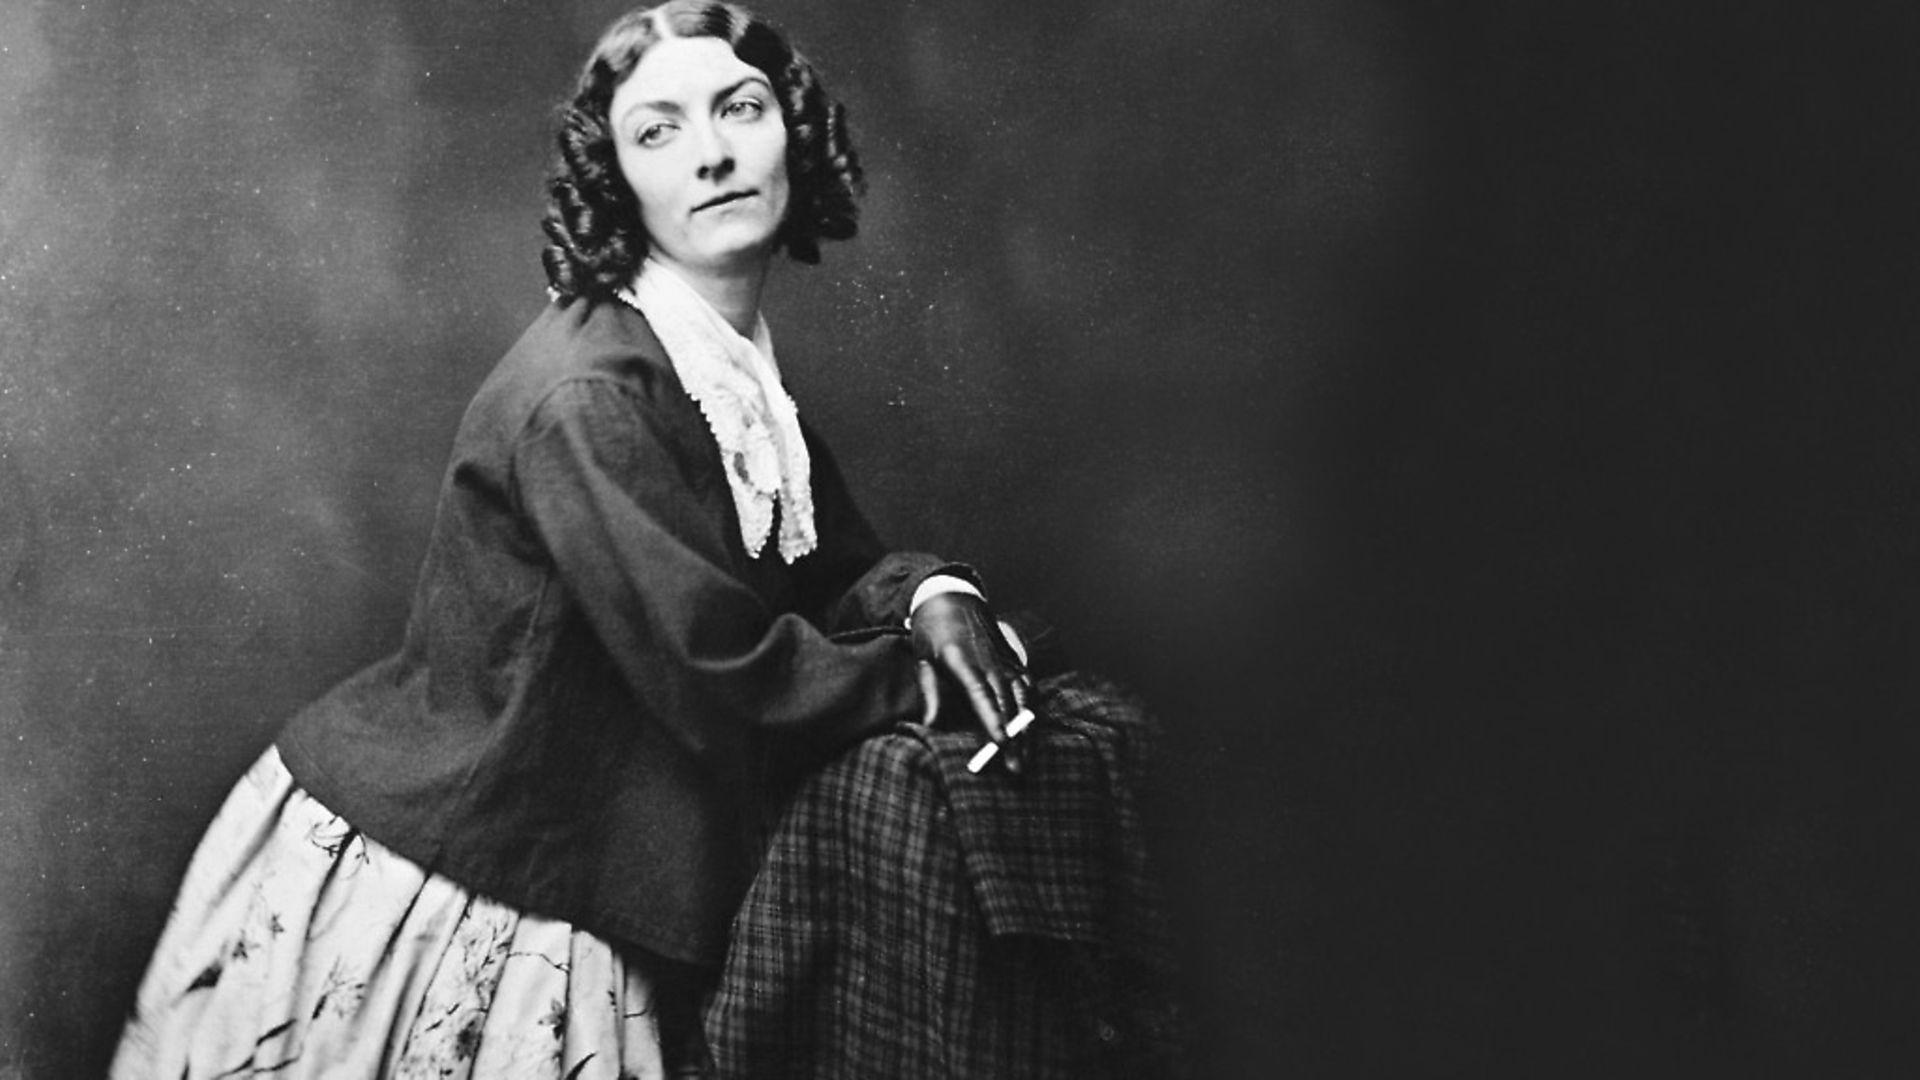 Lola Montez, British dancer and adventuress. Photo: Getty Images. - Credit: Bettmann Archive